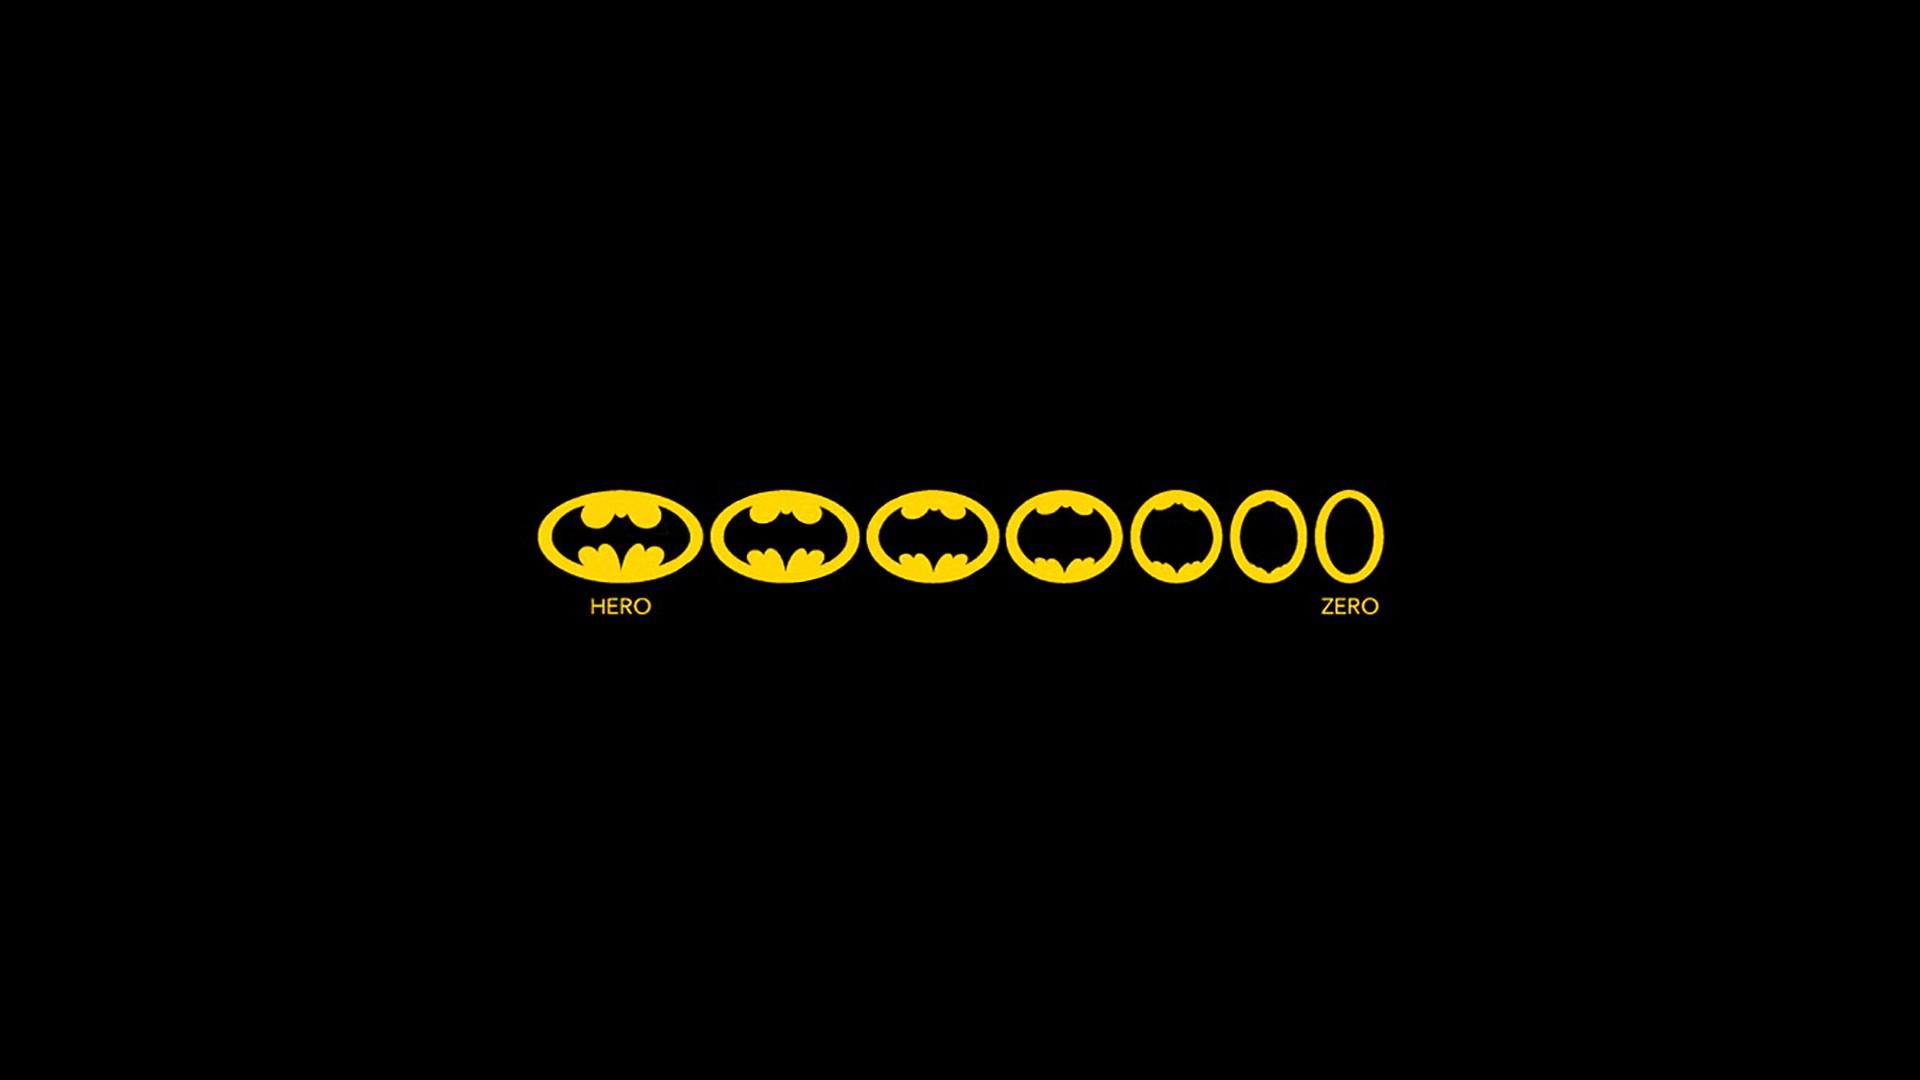 funny cool wallpapers wallpaper hero batman 1920x1080 1920x1080